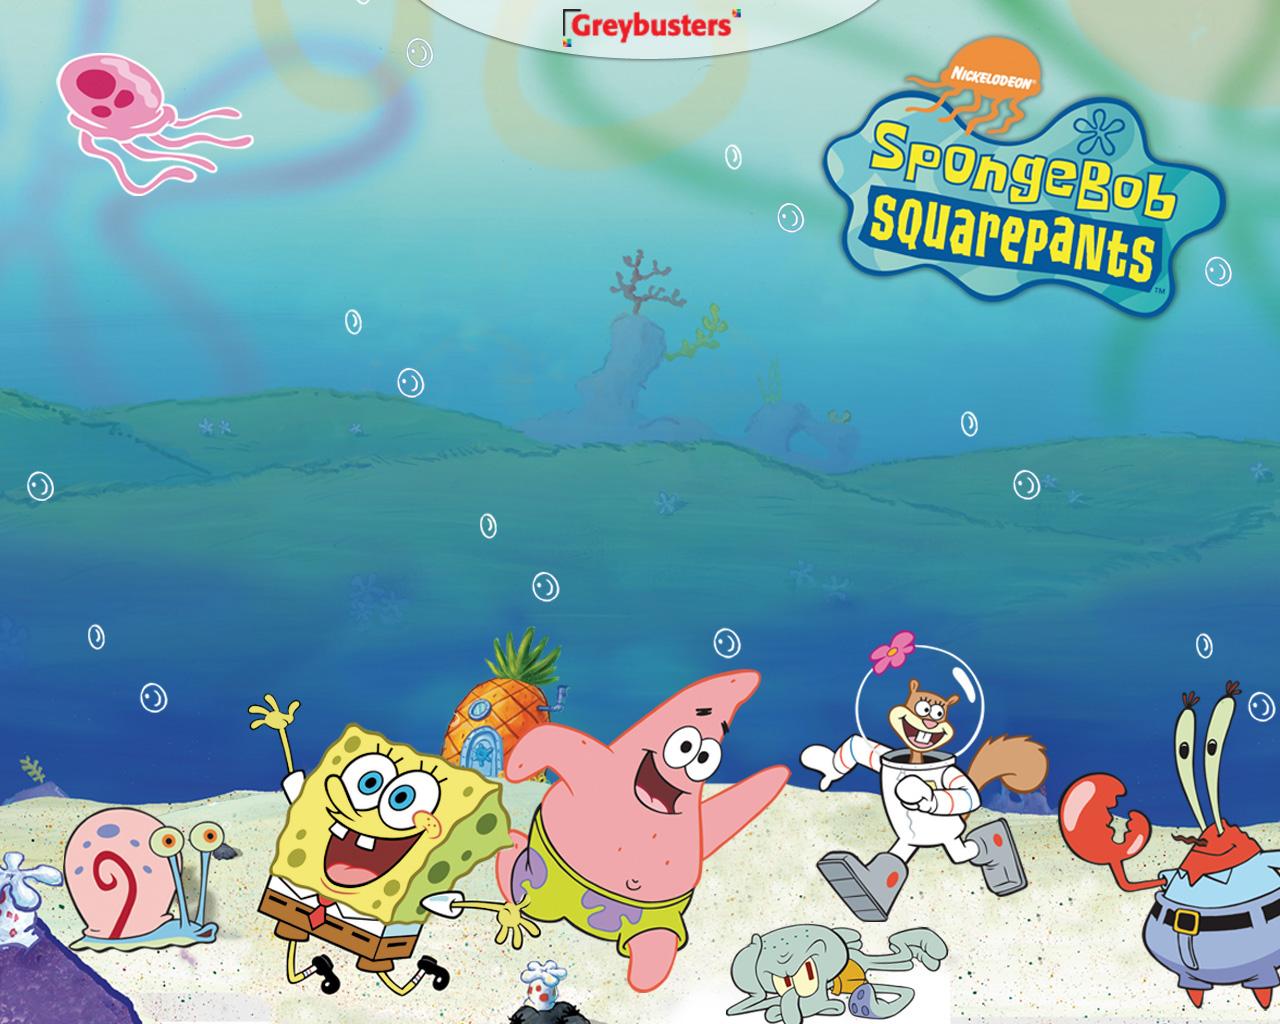 Image Spongebob Squarepants 399046g Jonovanpedia Wiki